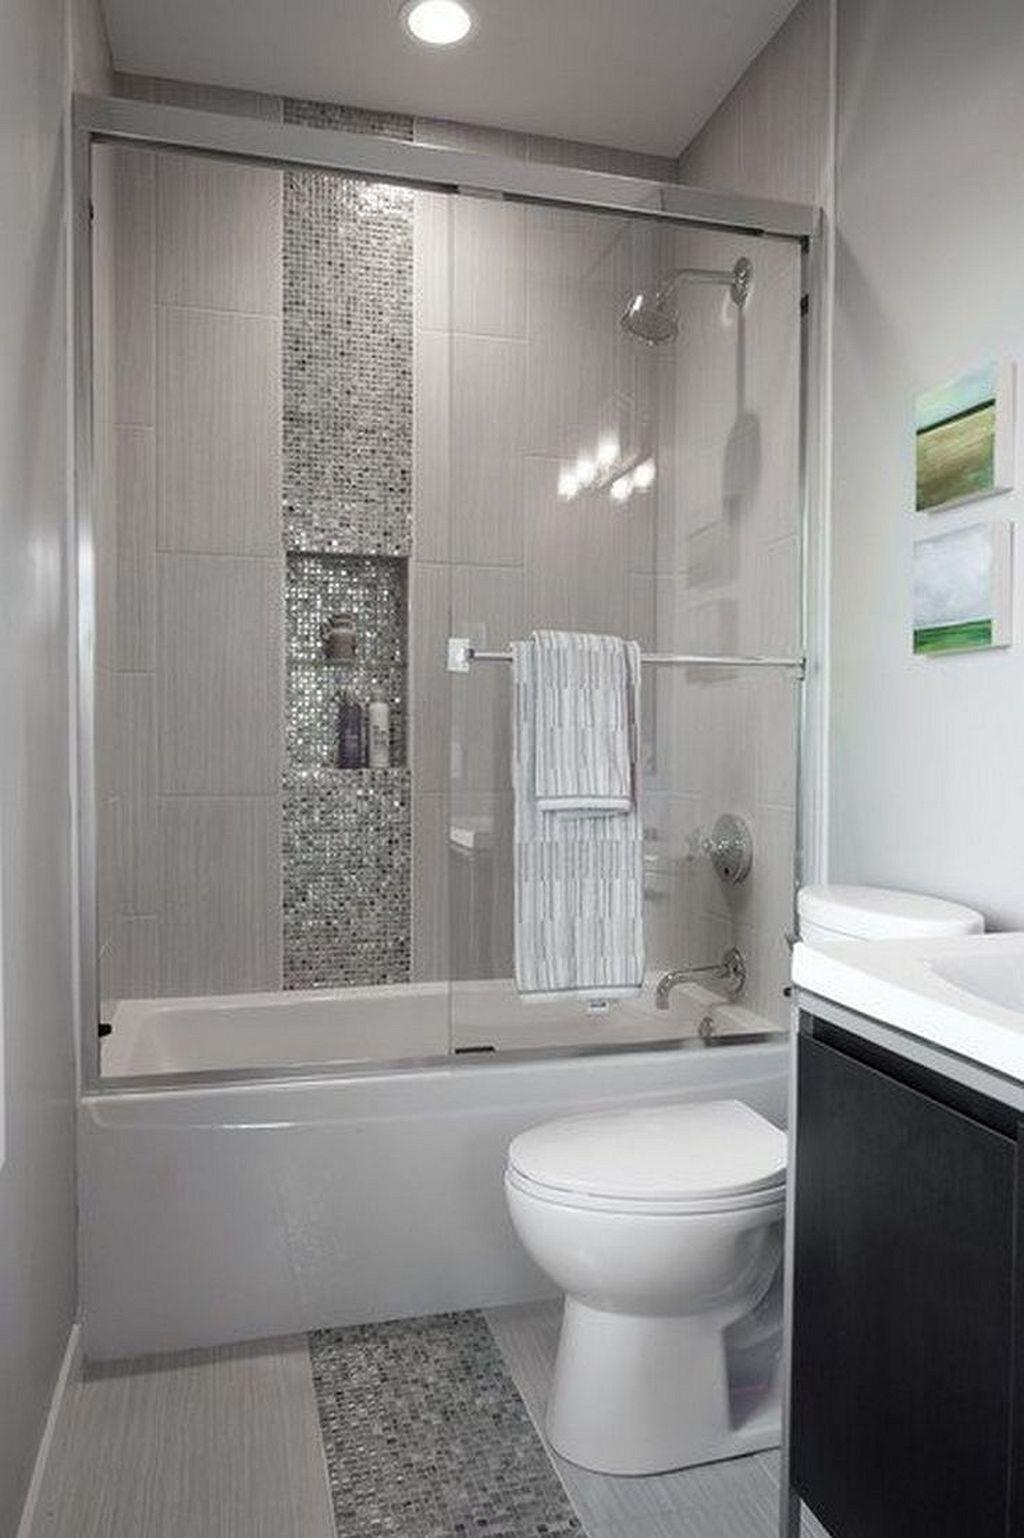 Latest Trends In Bathroom Tile Design 59 Bathroom Design Small Small Bathroom Bathroom Remodel Master